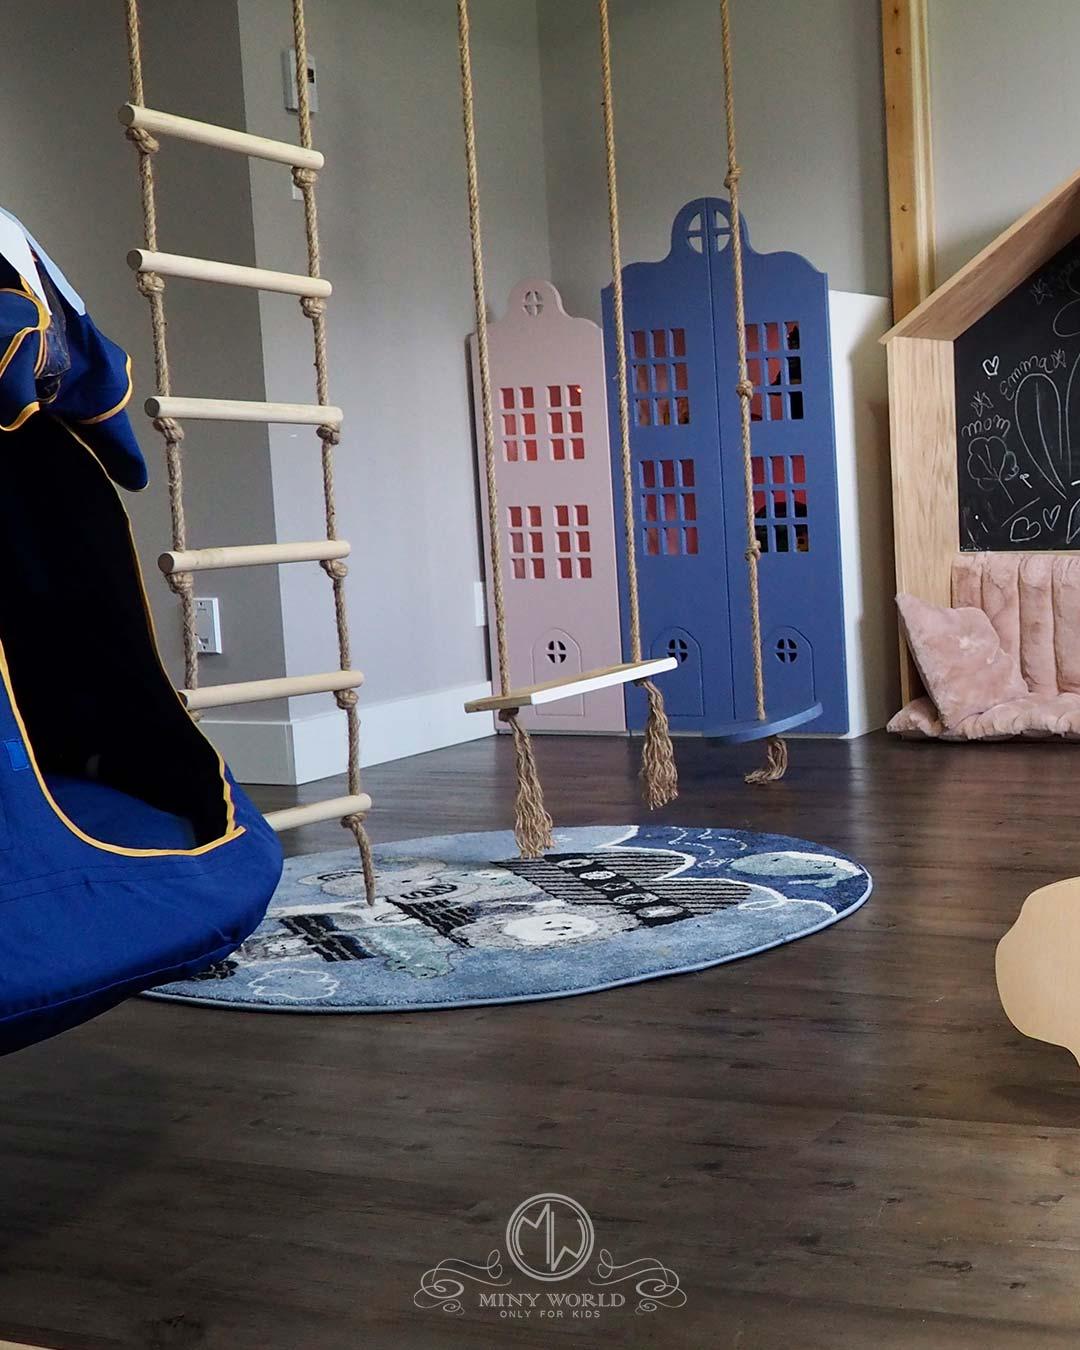 Noah_playroom_interior_design_minyworld_1